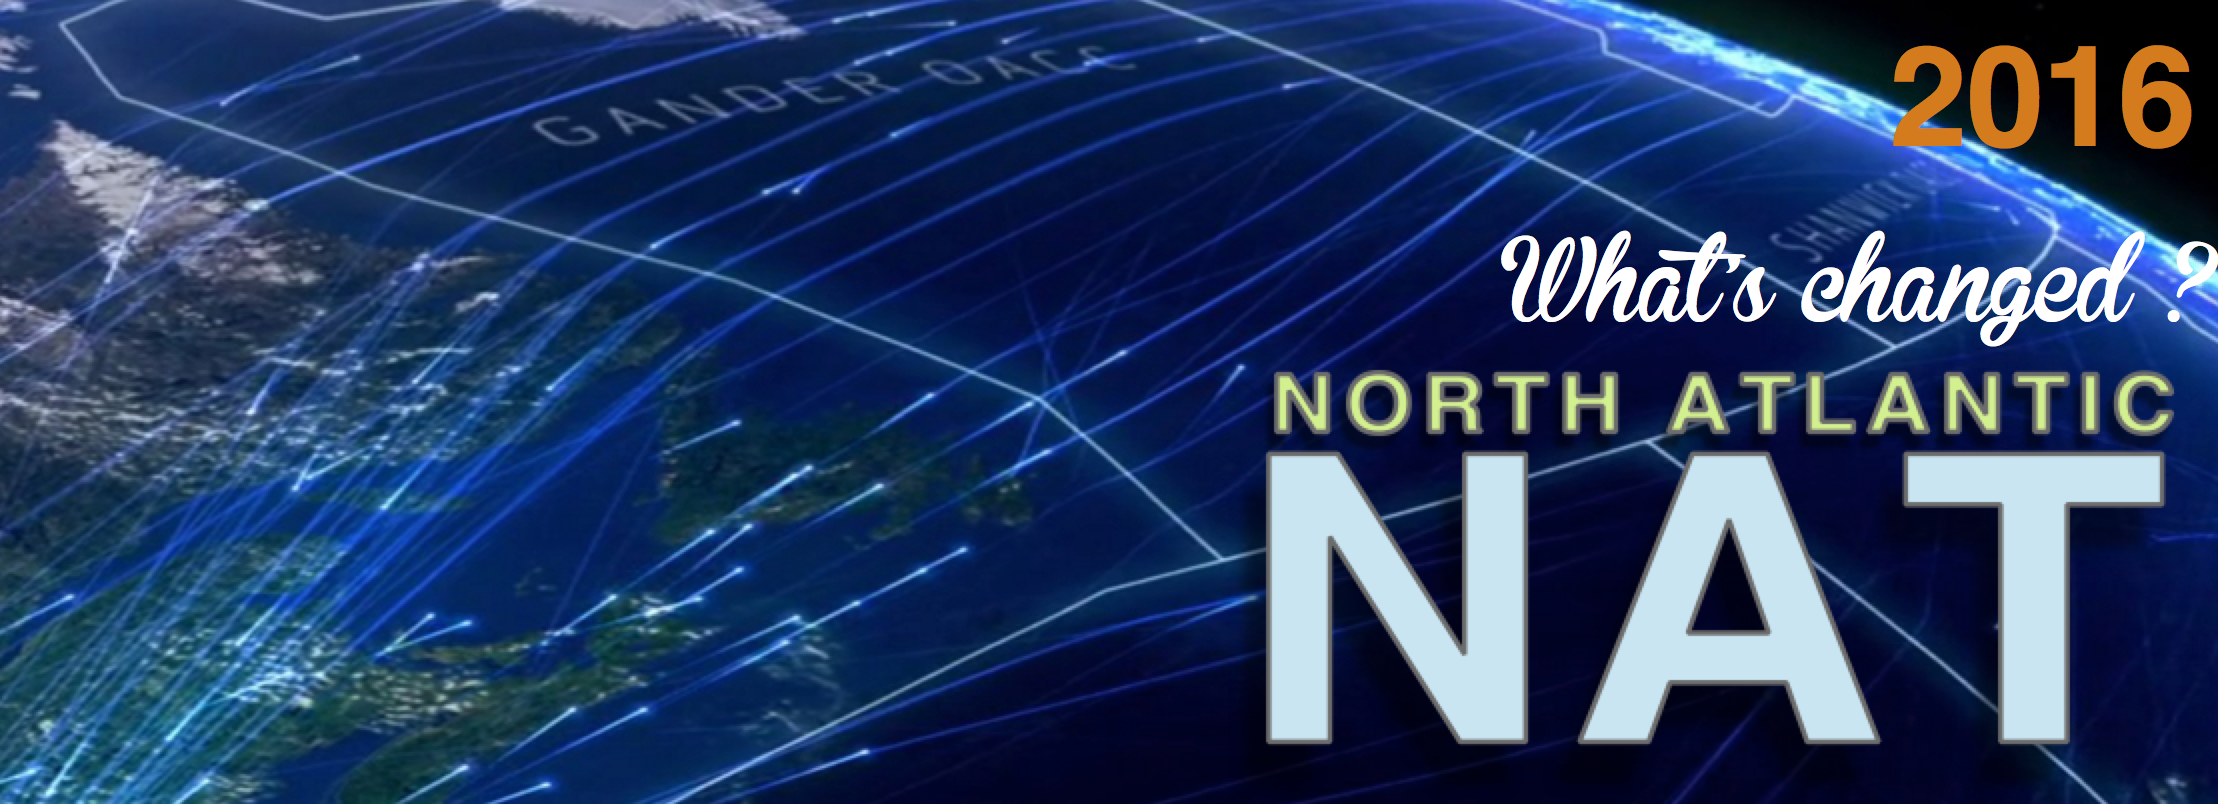 Shanwick/Gander: New NAT procedure – Confirm Assigned Route